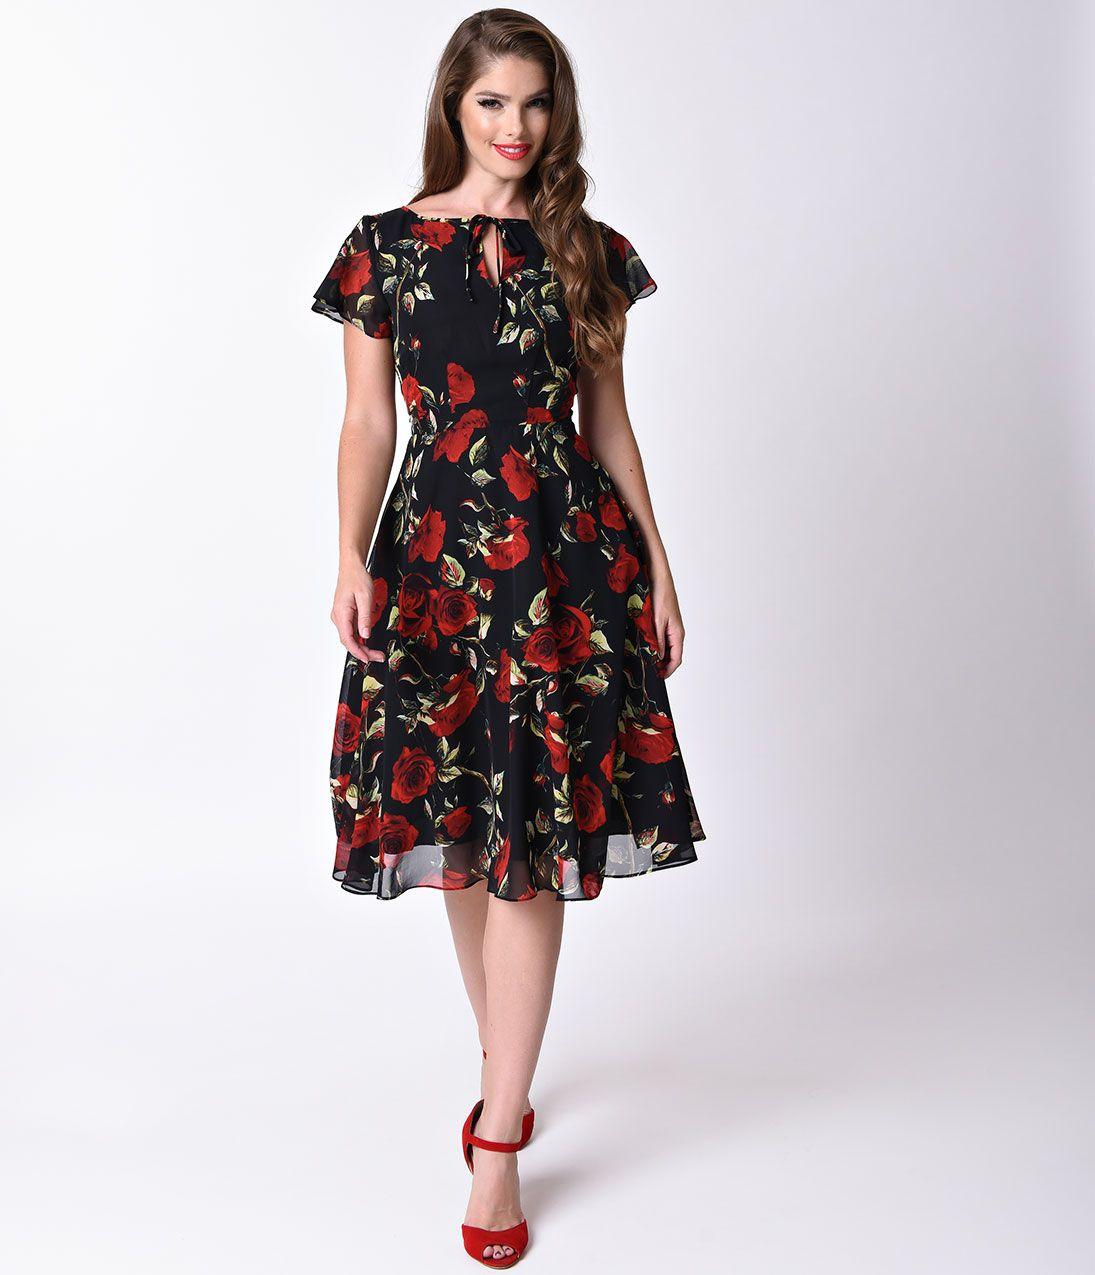 1940s dresses plus size uk models